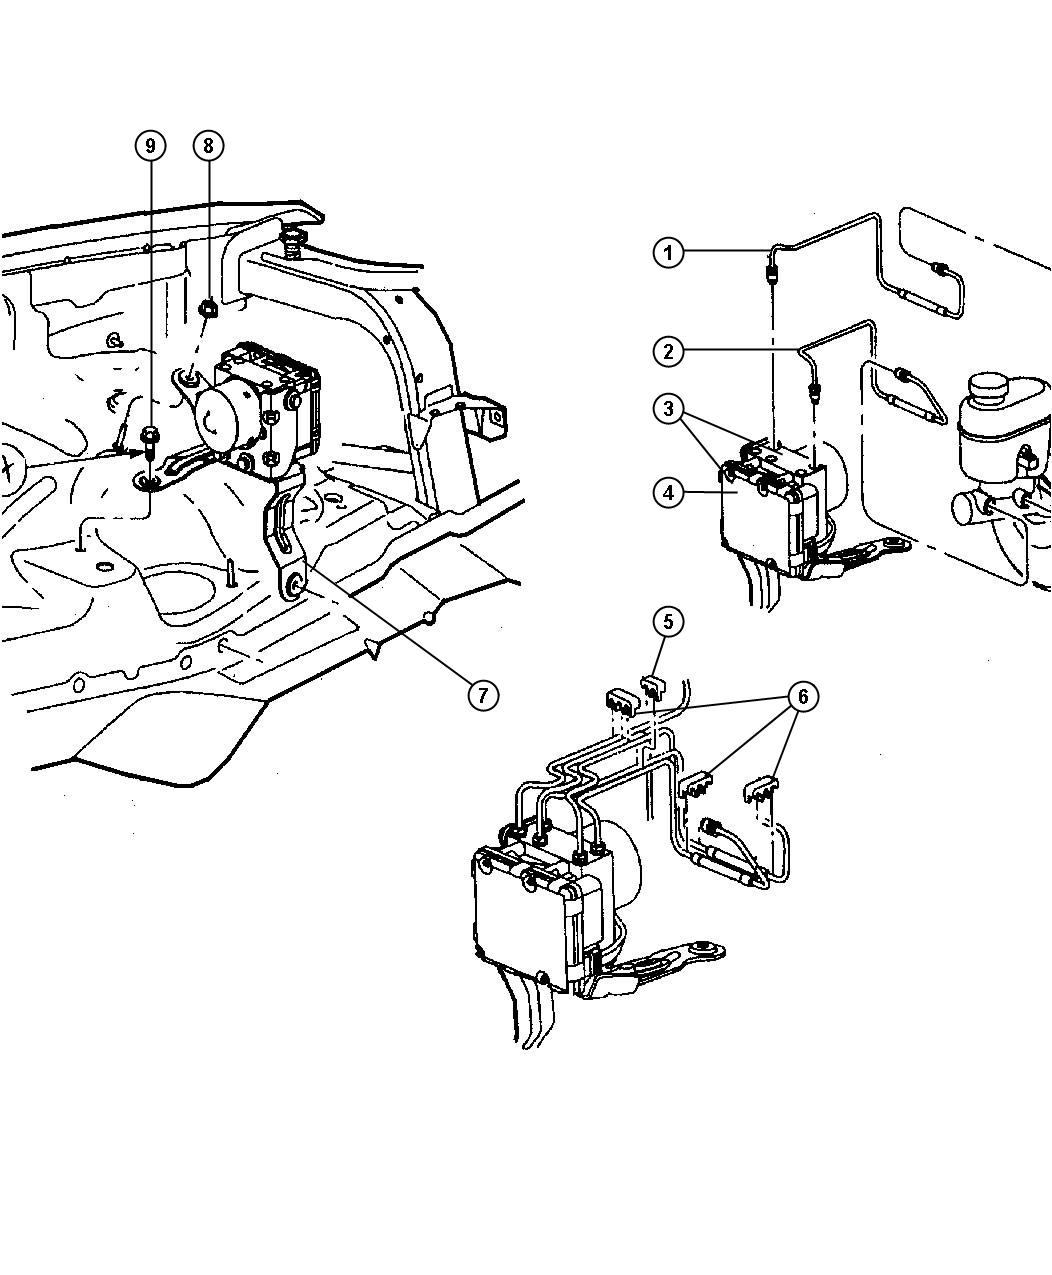 Dodge Viper Control Unit Anti Lock Brake Hydraulic Disc Wheel Brakes